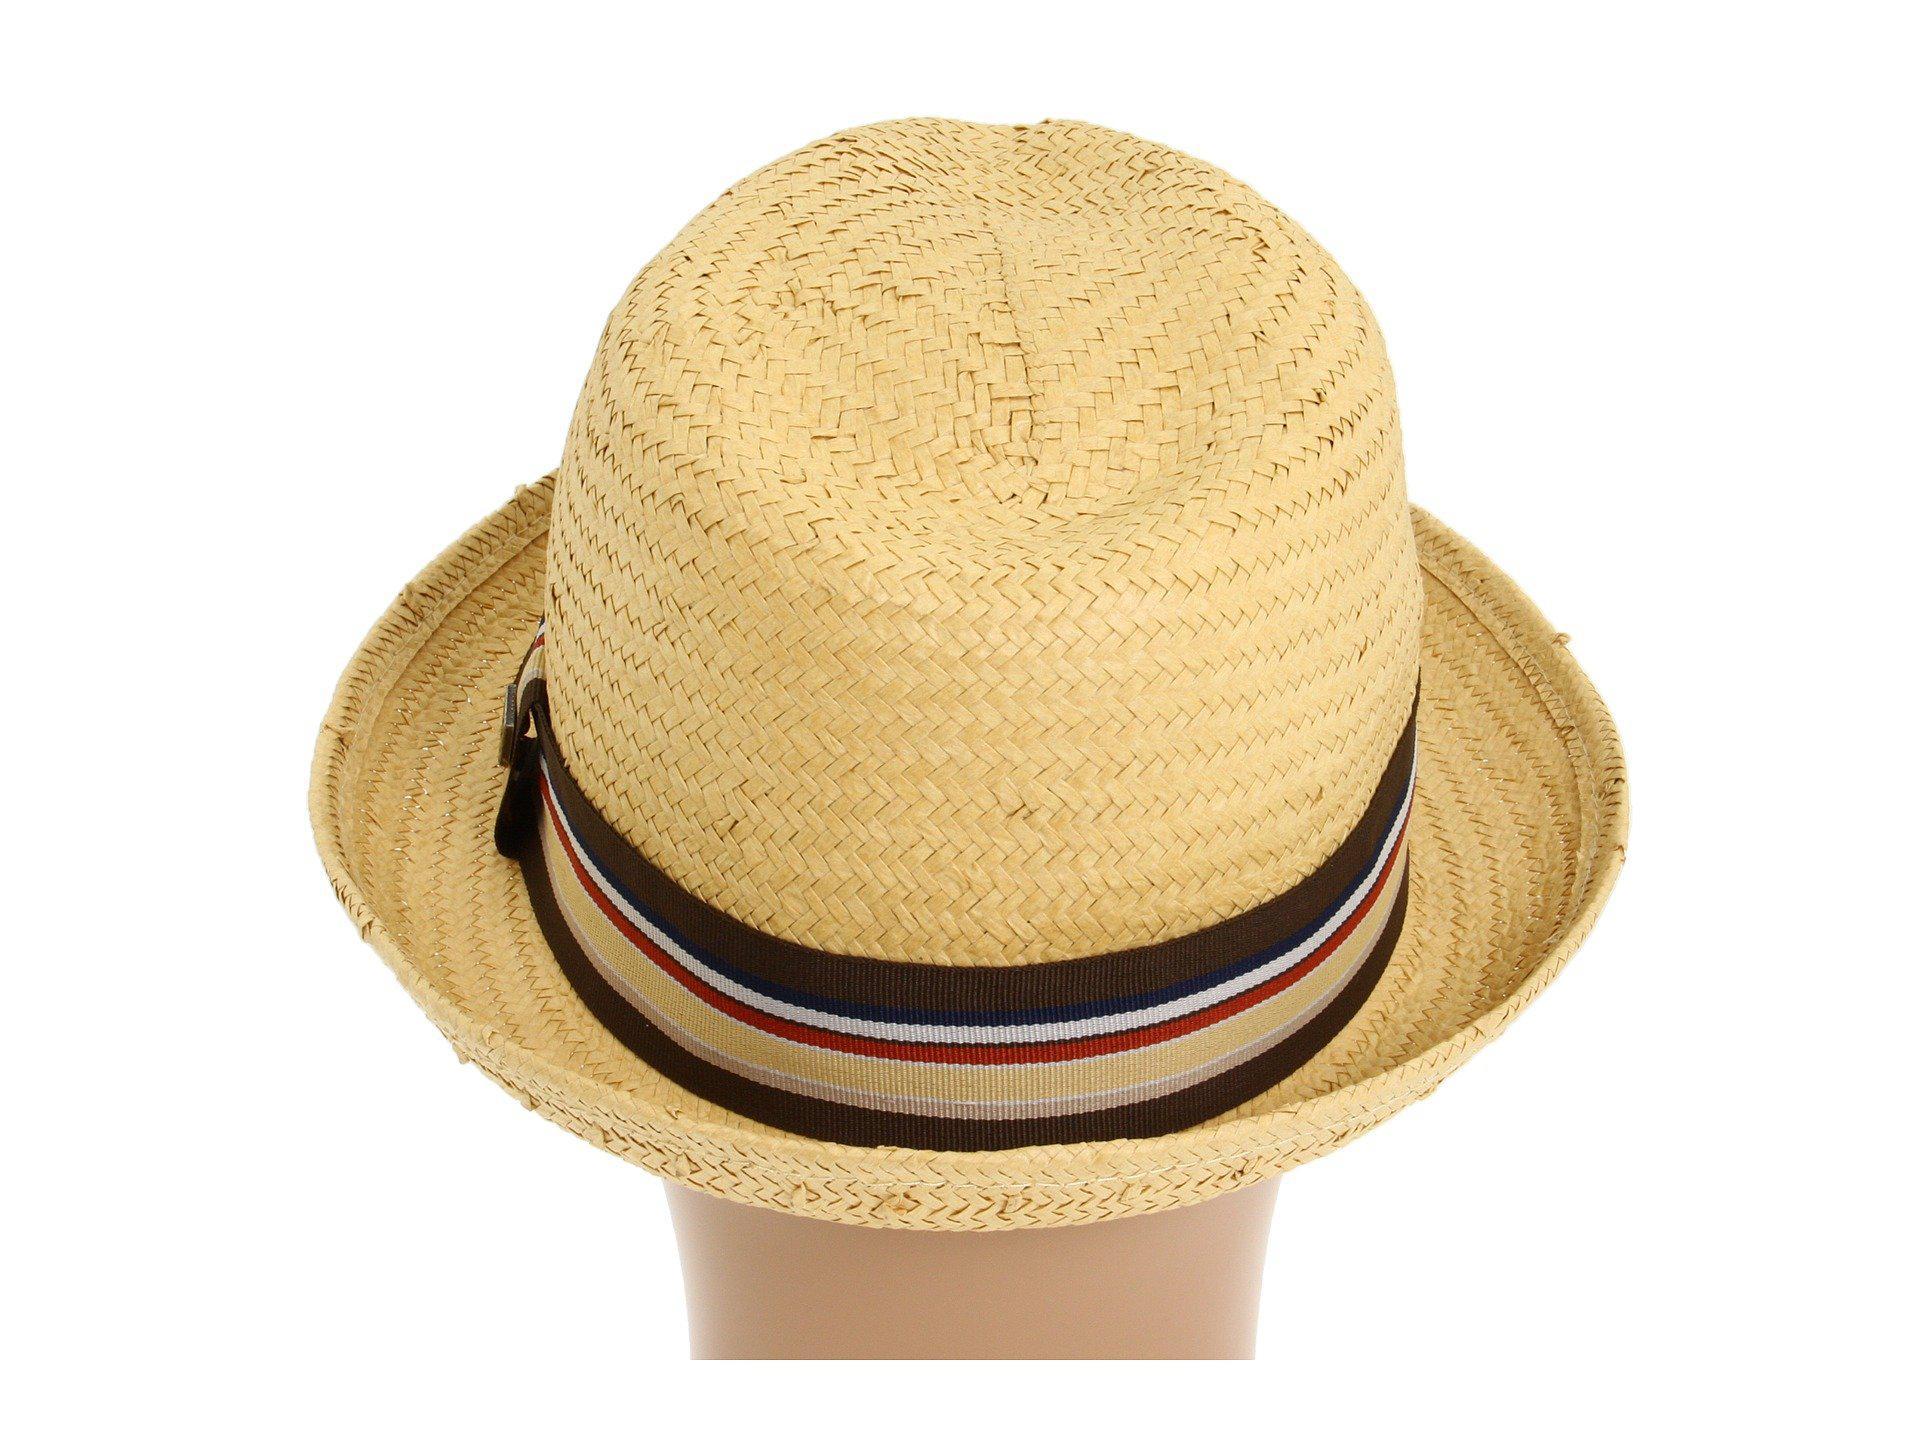 59f21c2f1c6fb Brixton - Natural Castor (tan Straw) Traditional Hats - Lyst. View  fullscreen